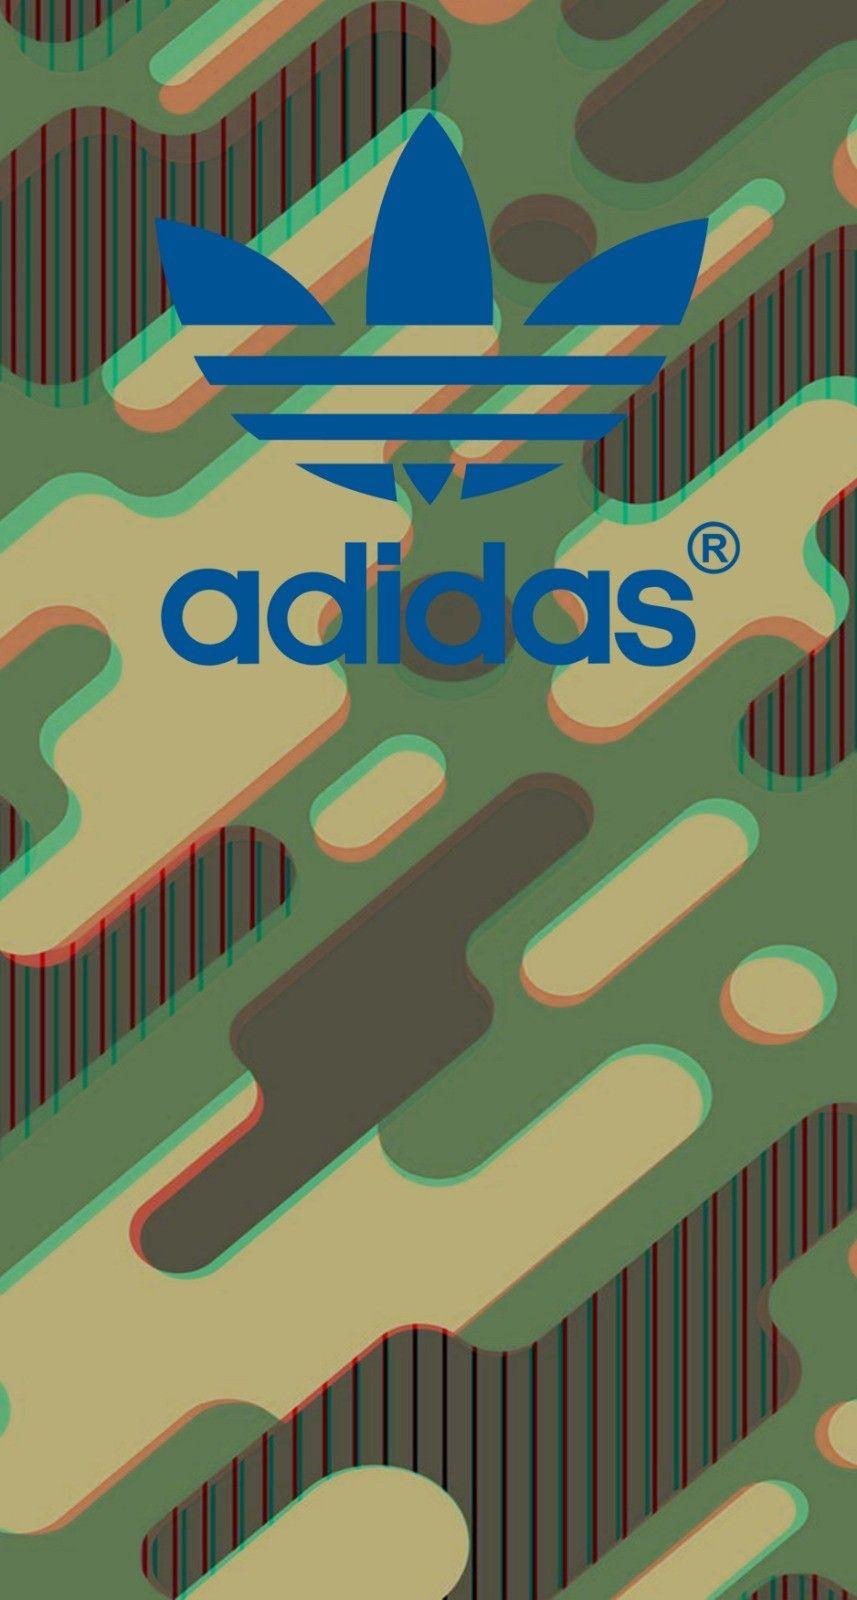 Pin by נתנאל נחשון on lol Logos, Lol, Adidas logo